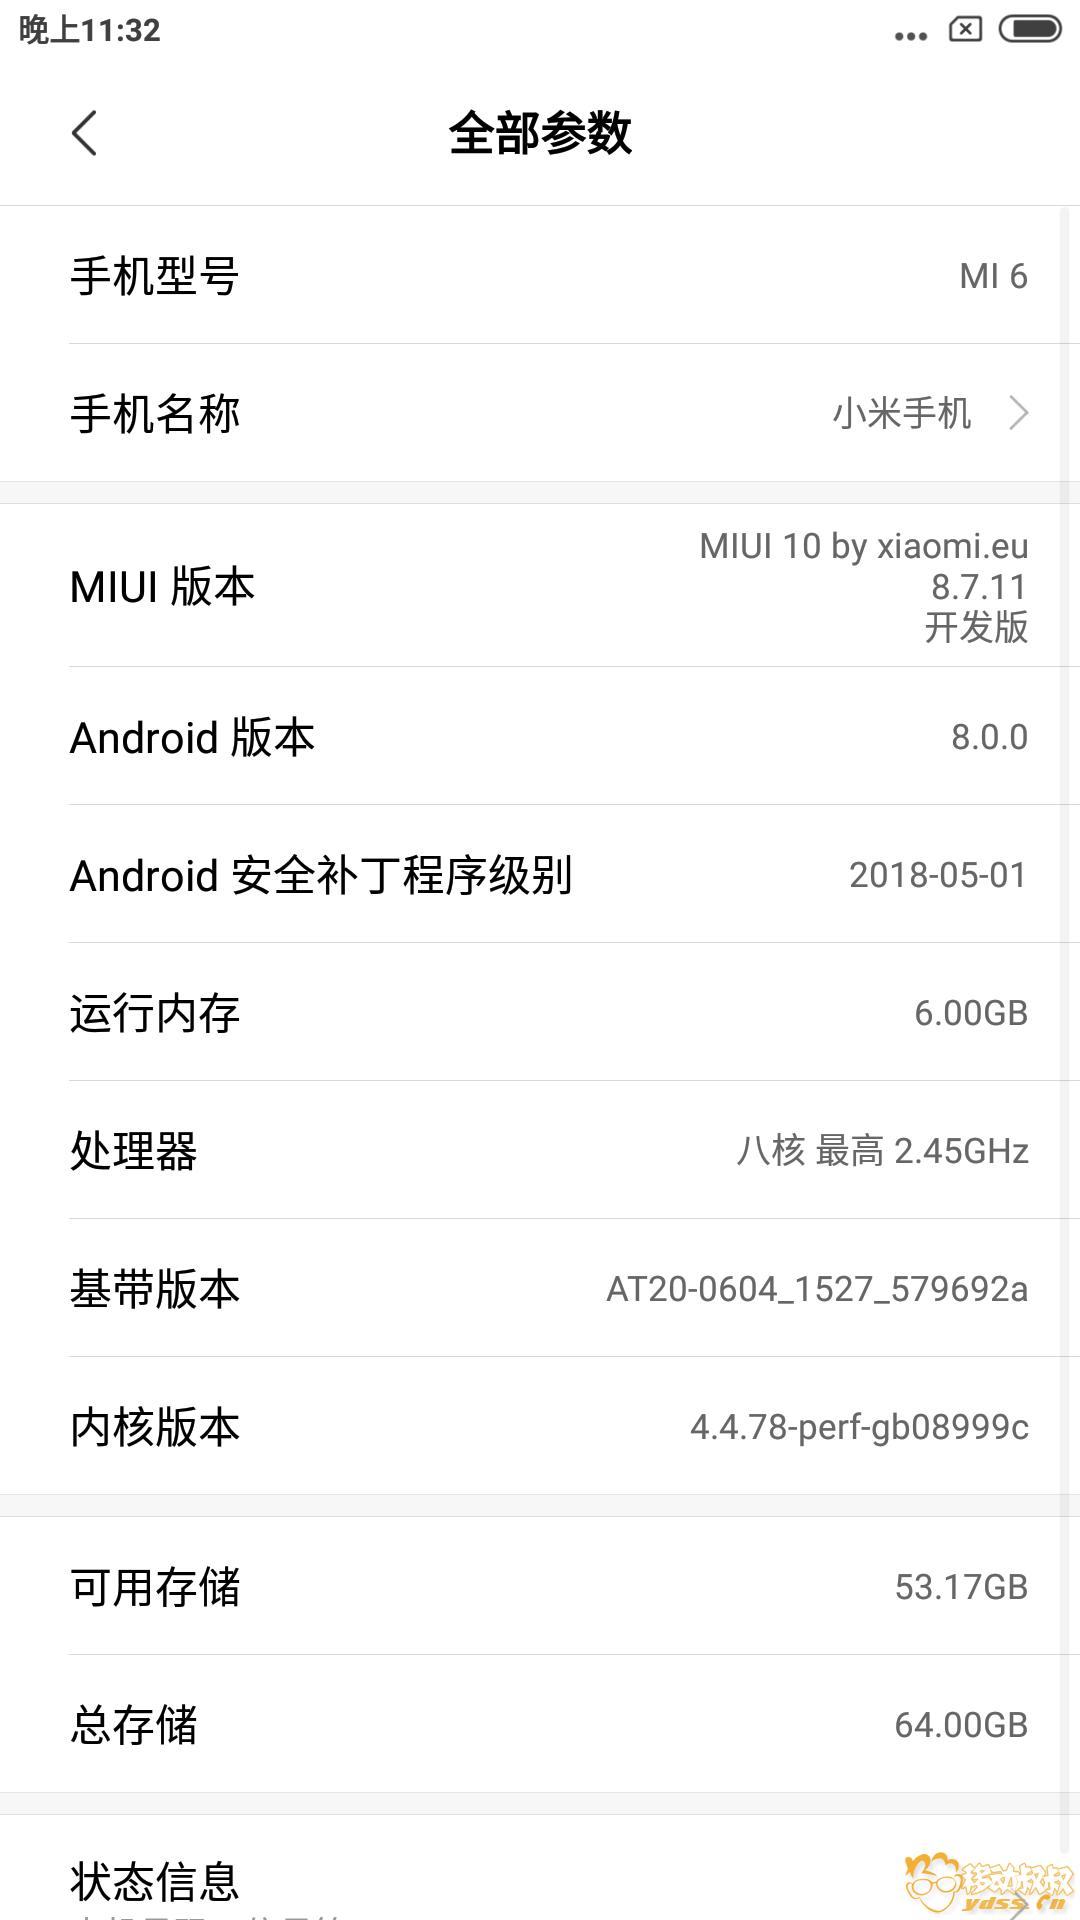 Screenshot_1970-12-26-23-32-40-274_com.android.settings.png